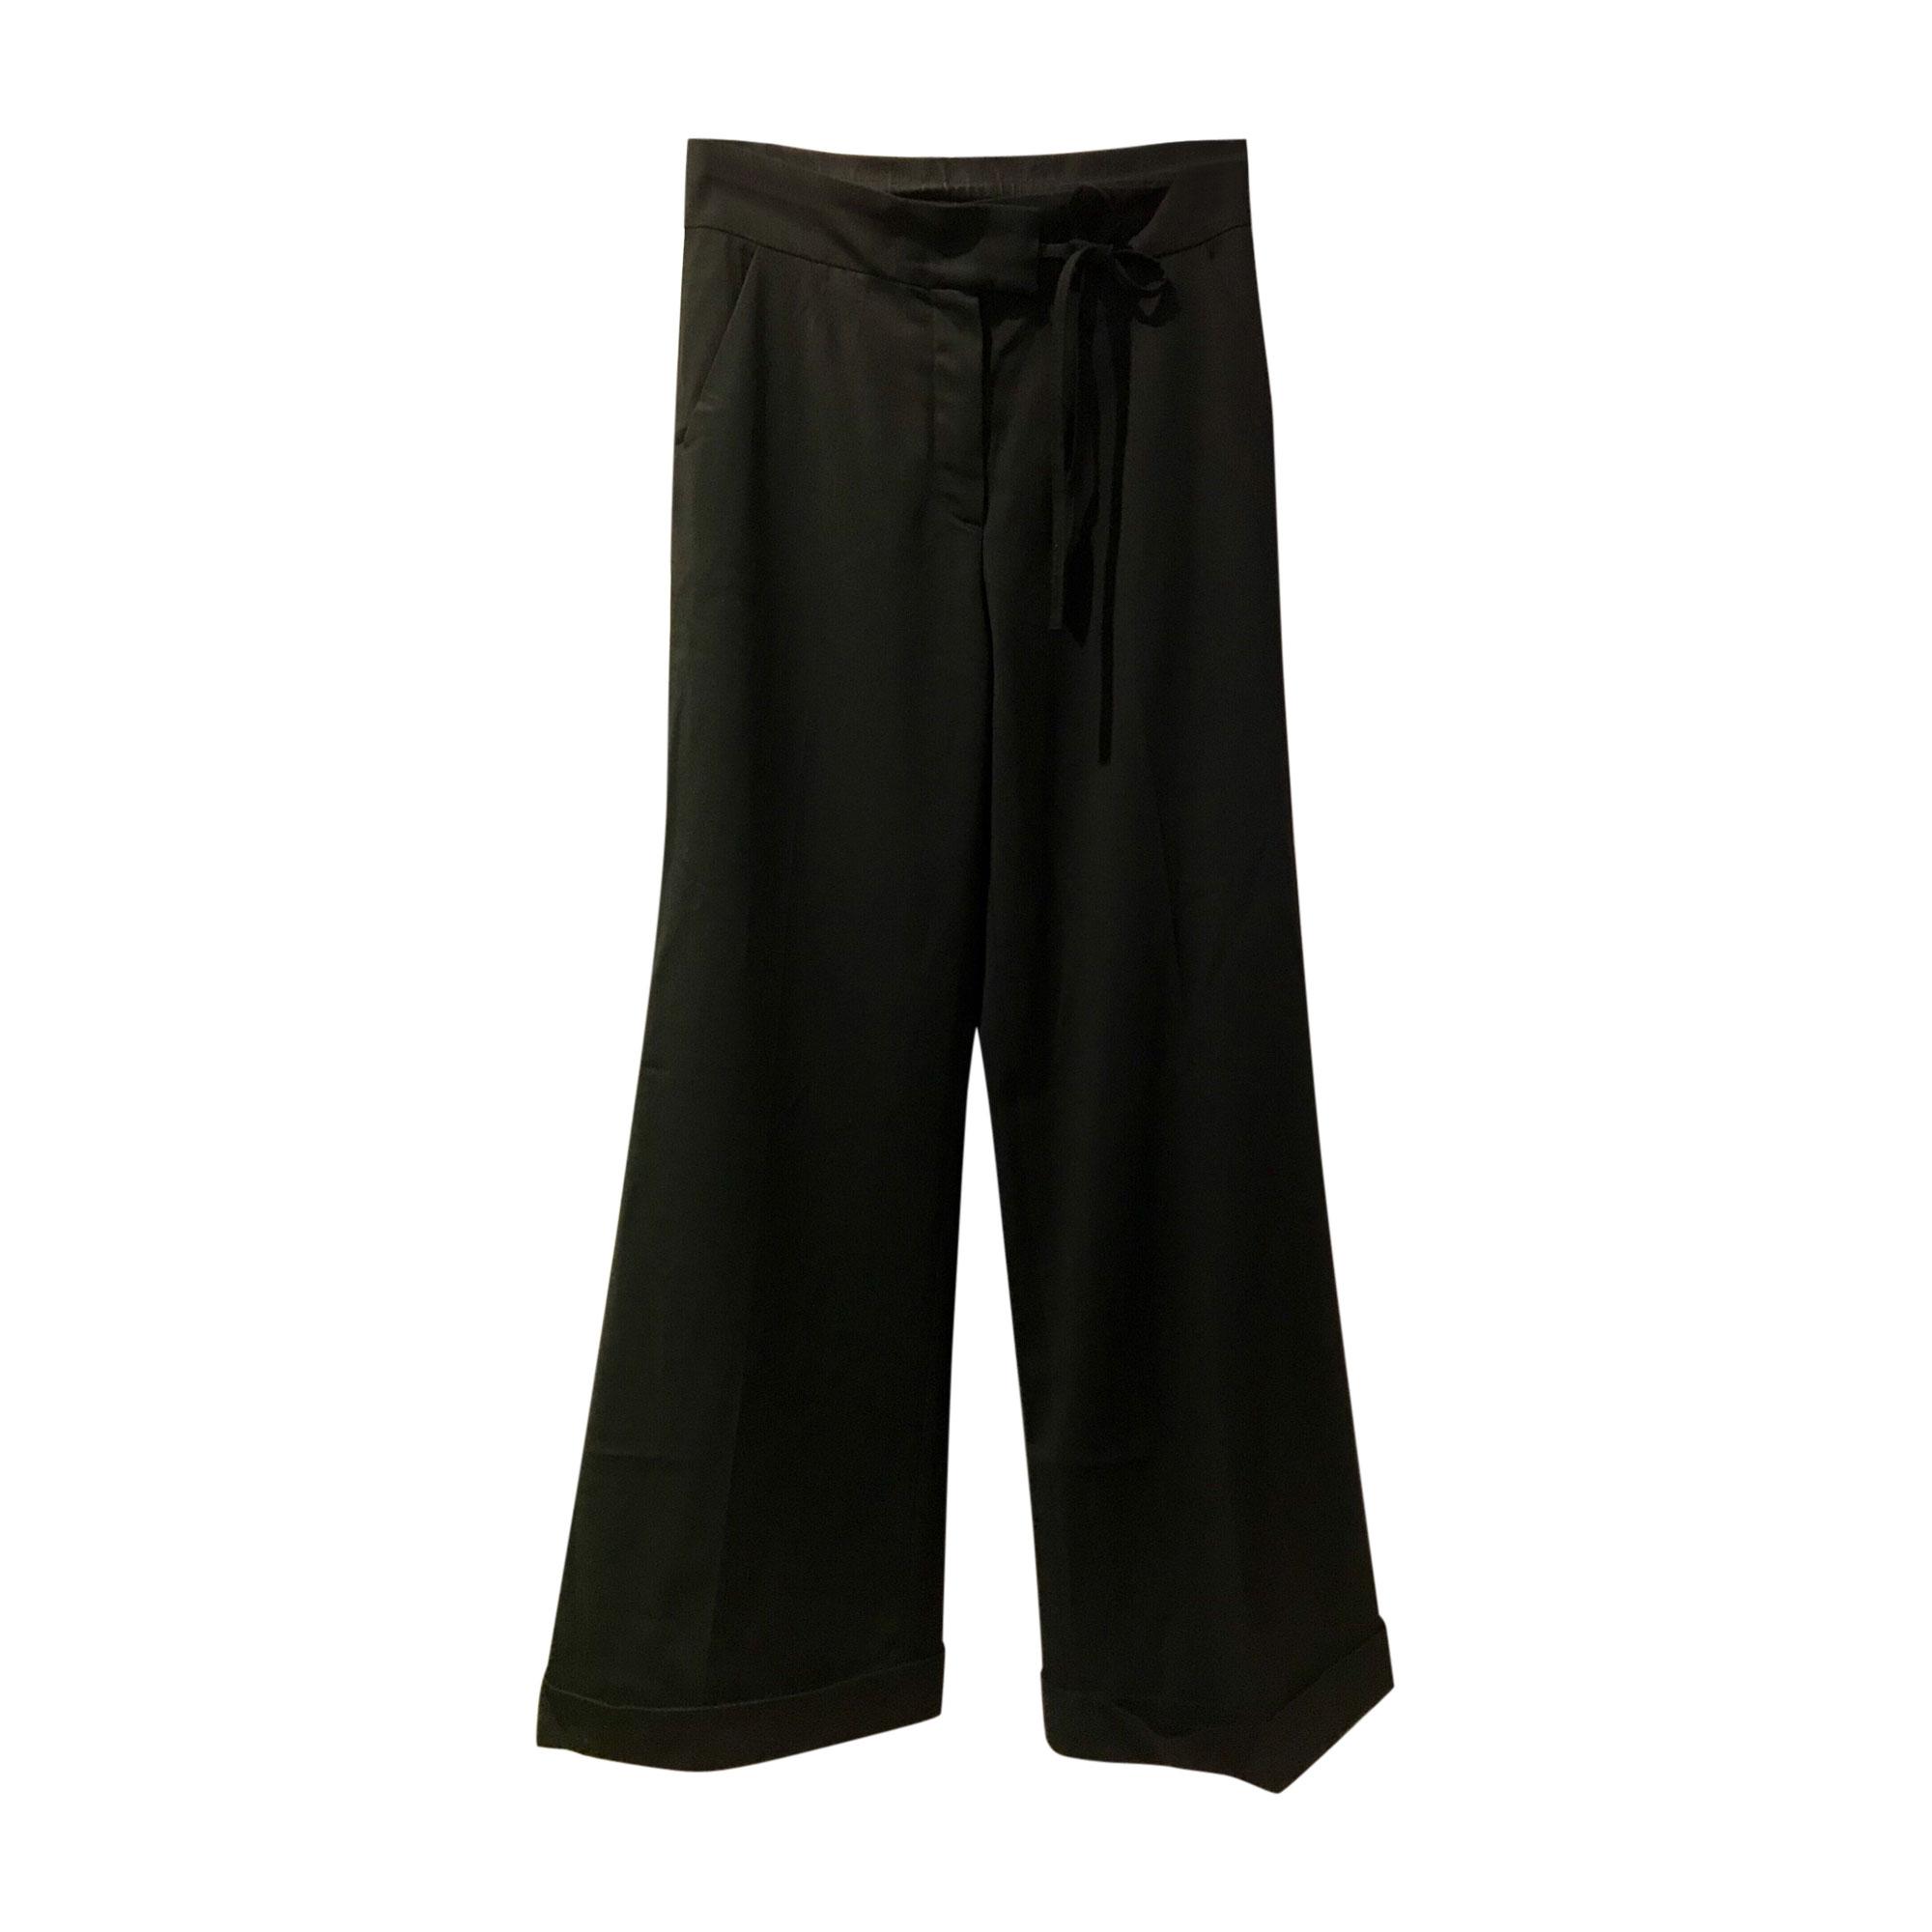 Pantalon large SONIA BY SONIA RYKIEL Noir